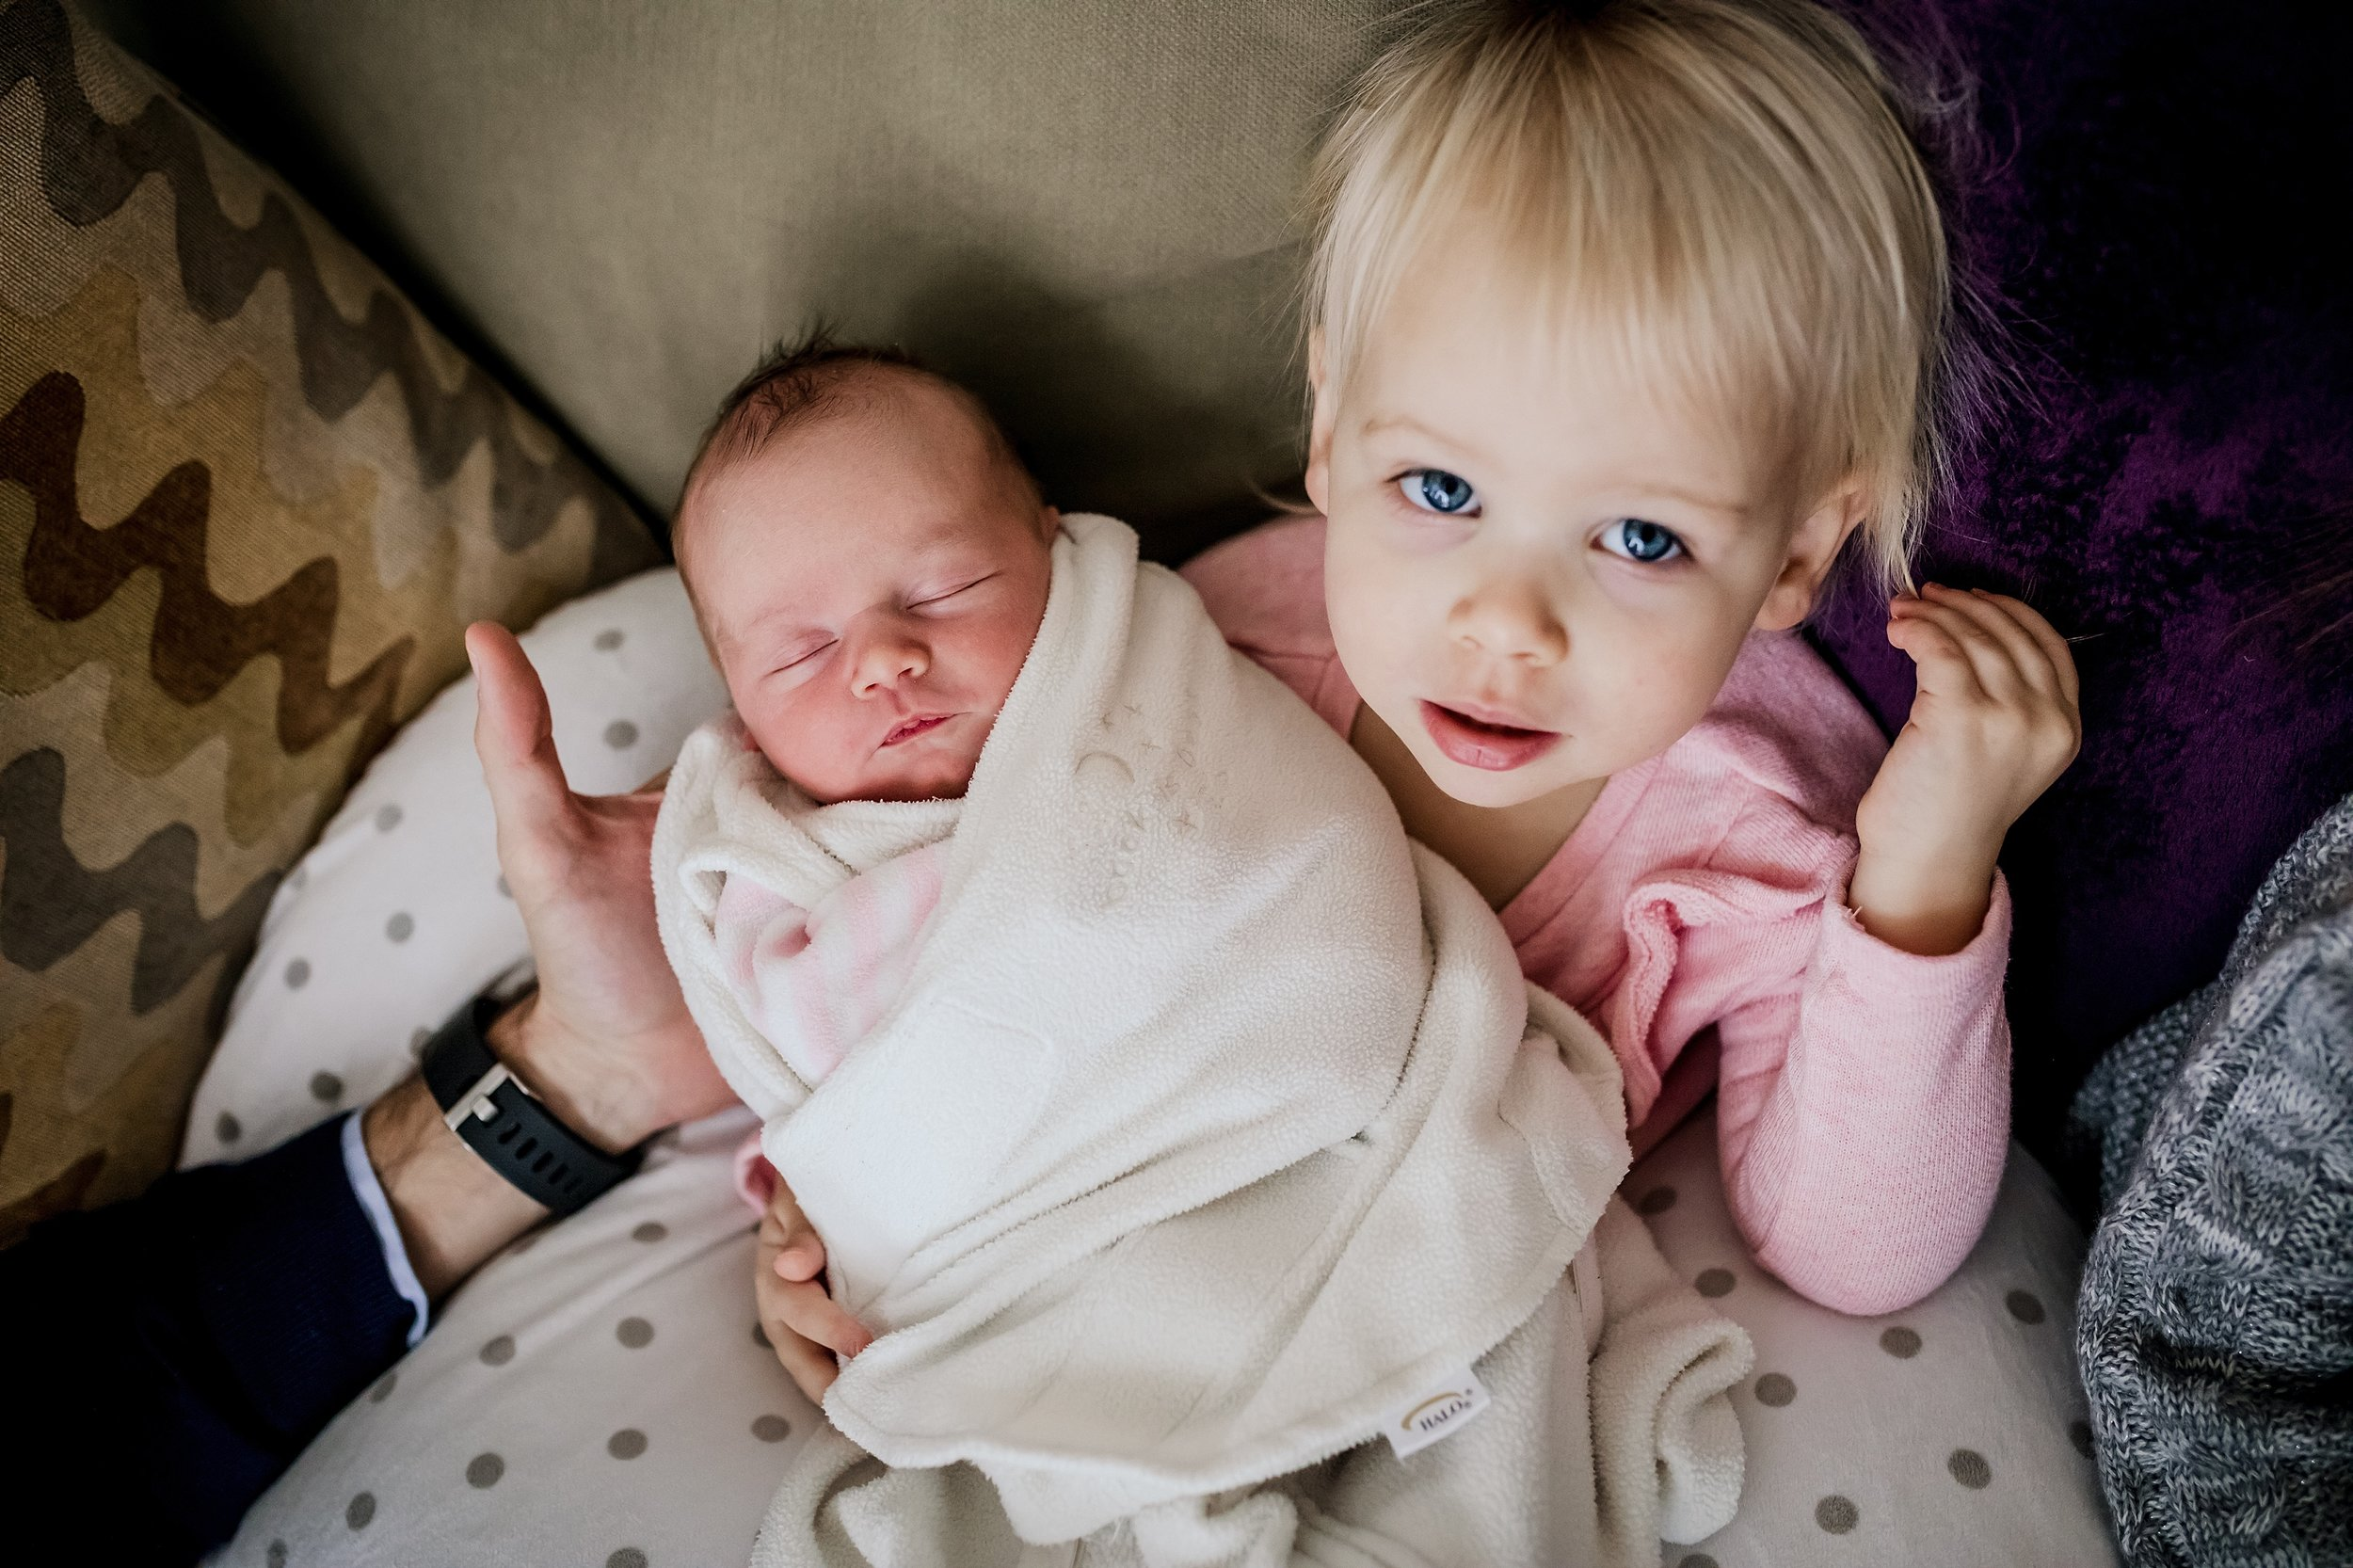 Lehigh-Valley-Documentary-Newborn-Photographer_0010.jpg